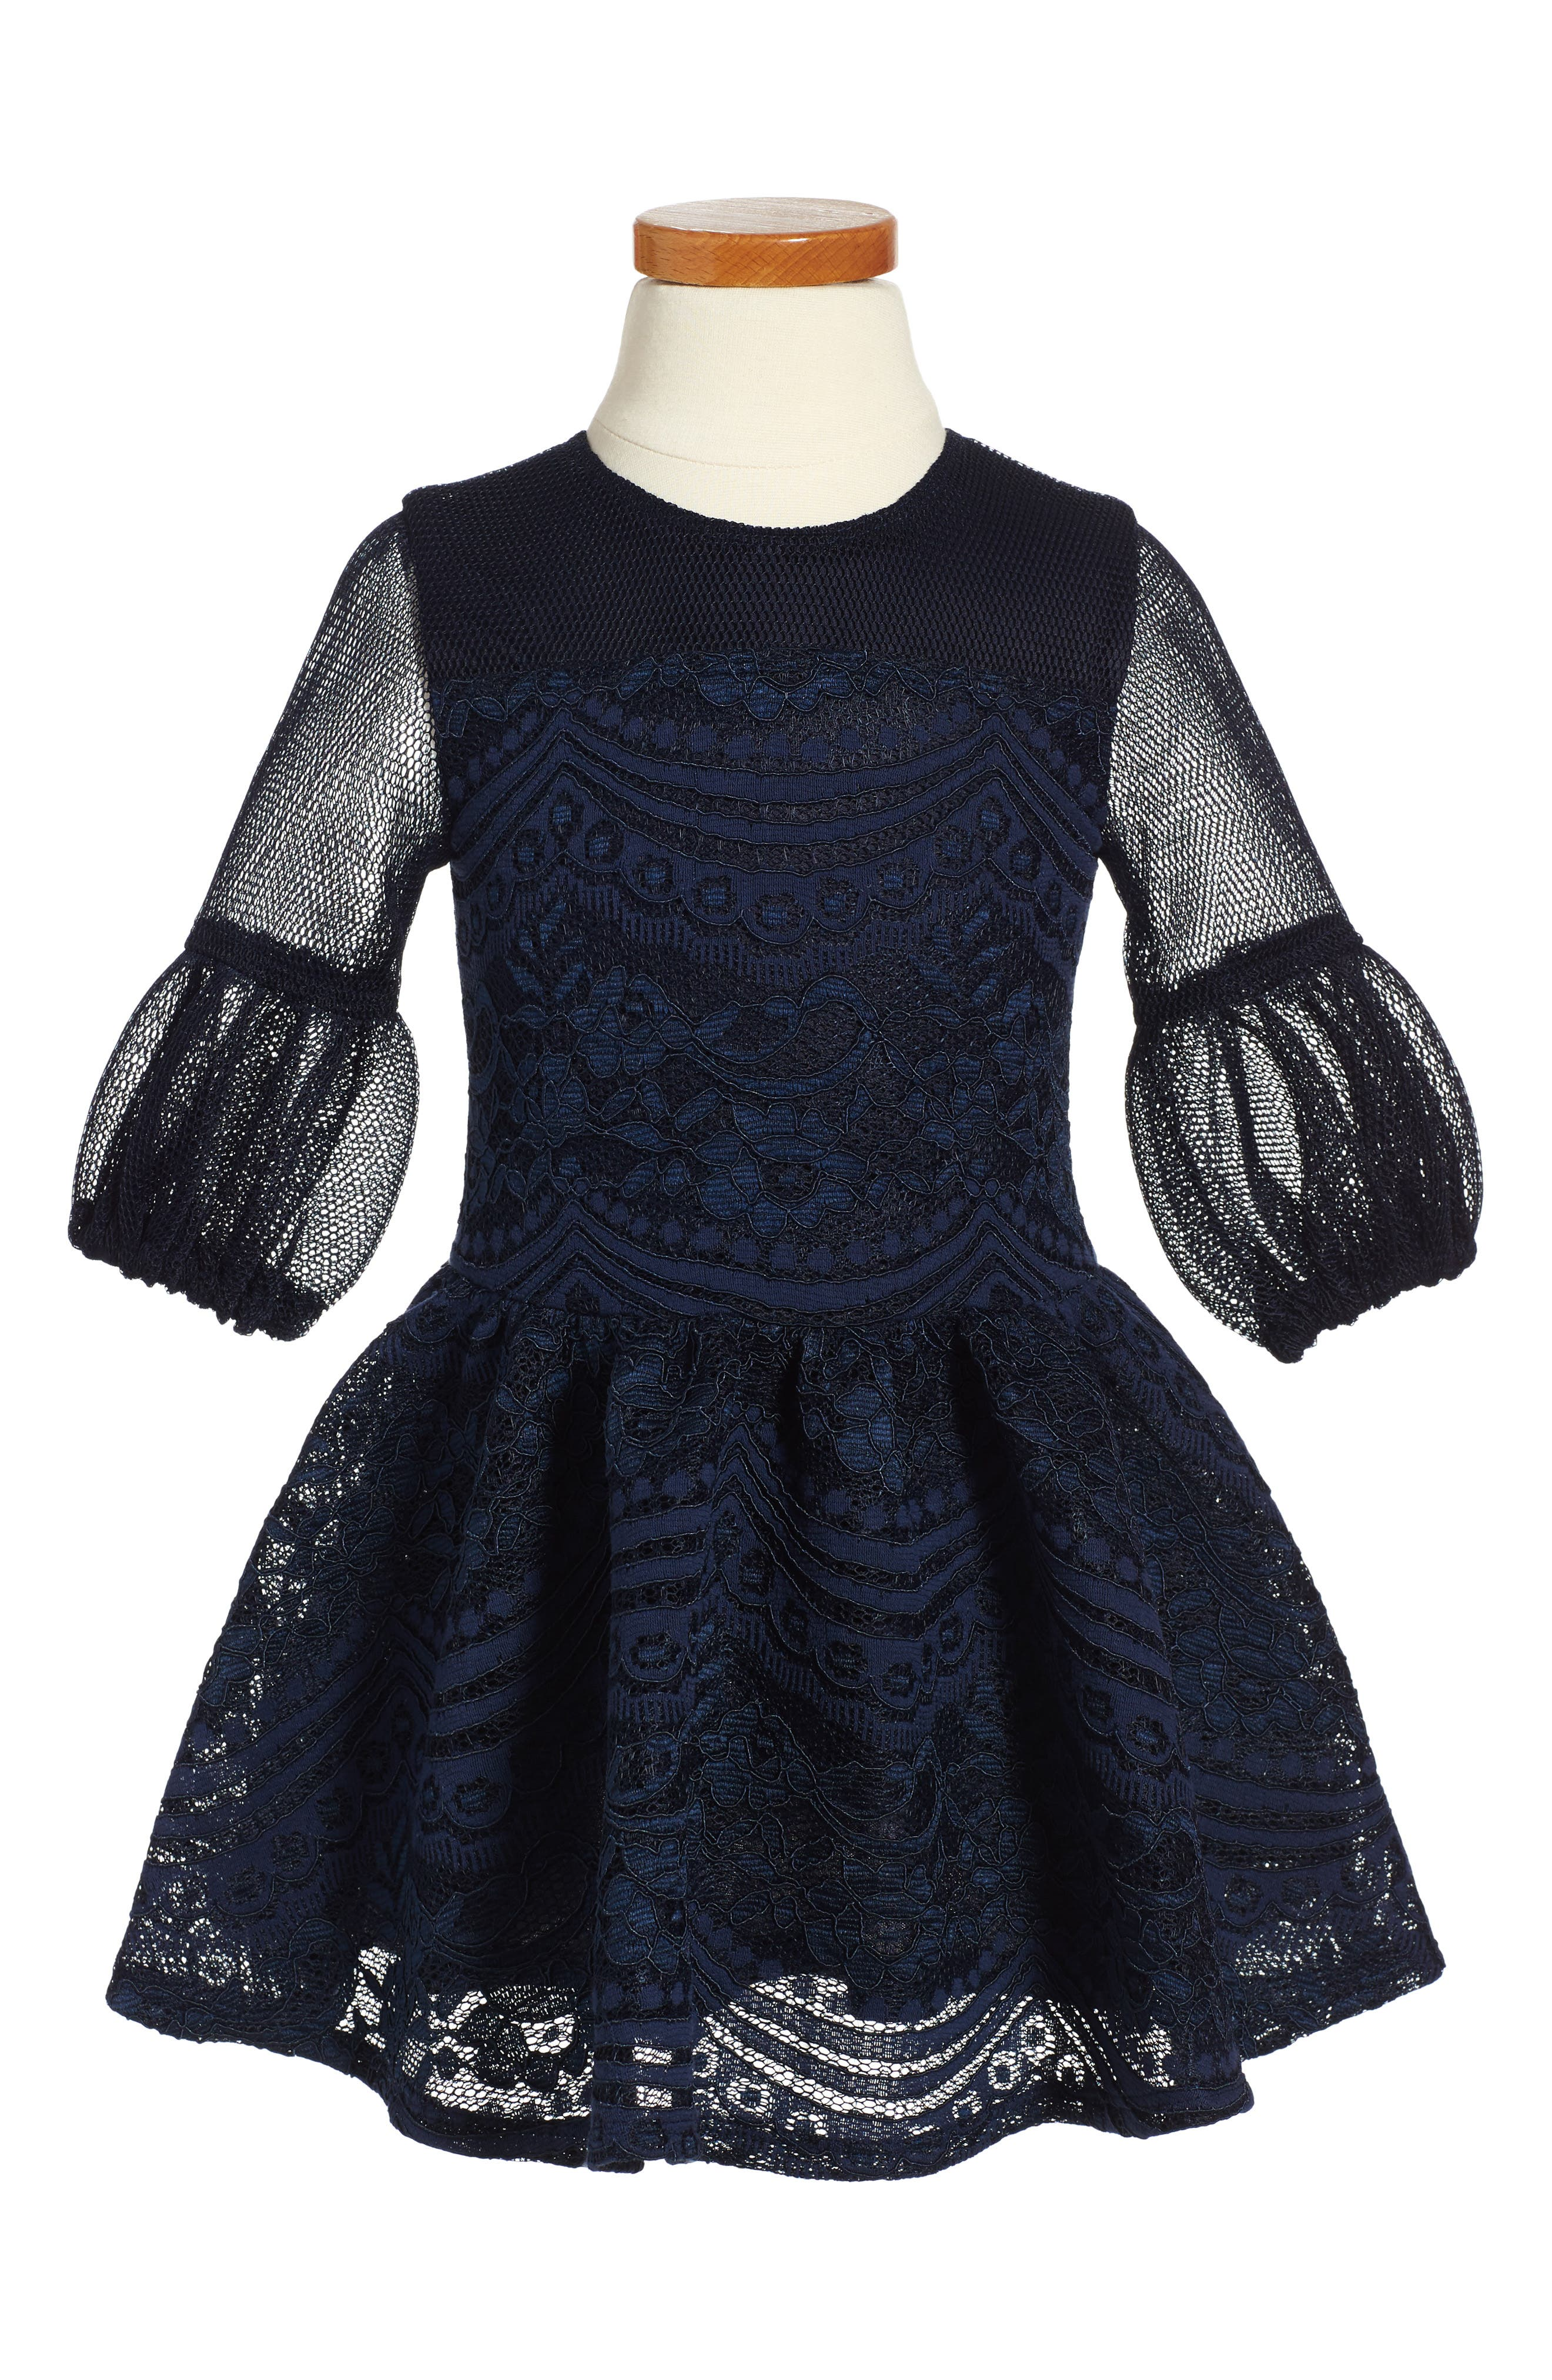 Techno Lace Dress,                         Main,                         color, Navy